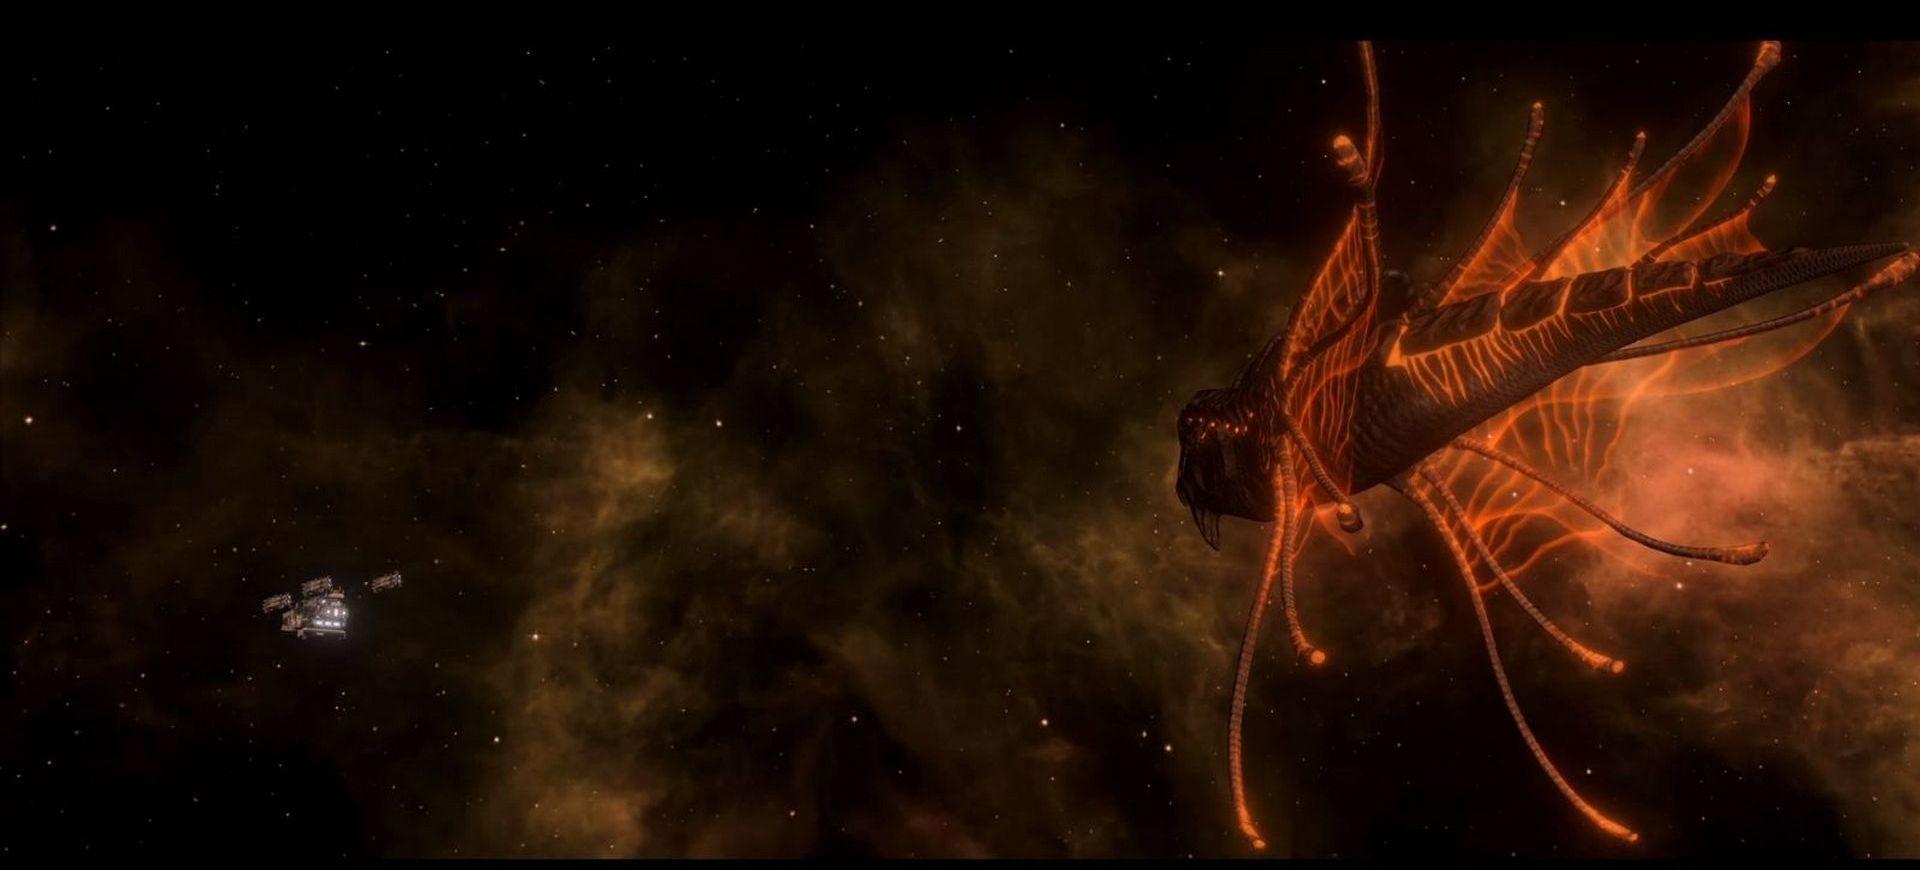 Stellaris: Leviathans - Đánh Giá Game